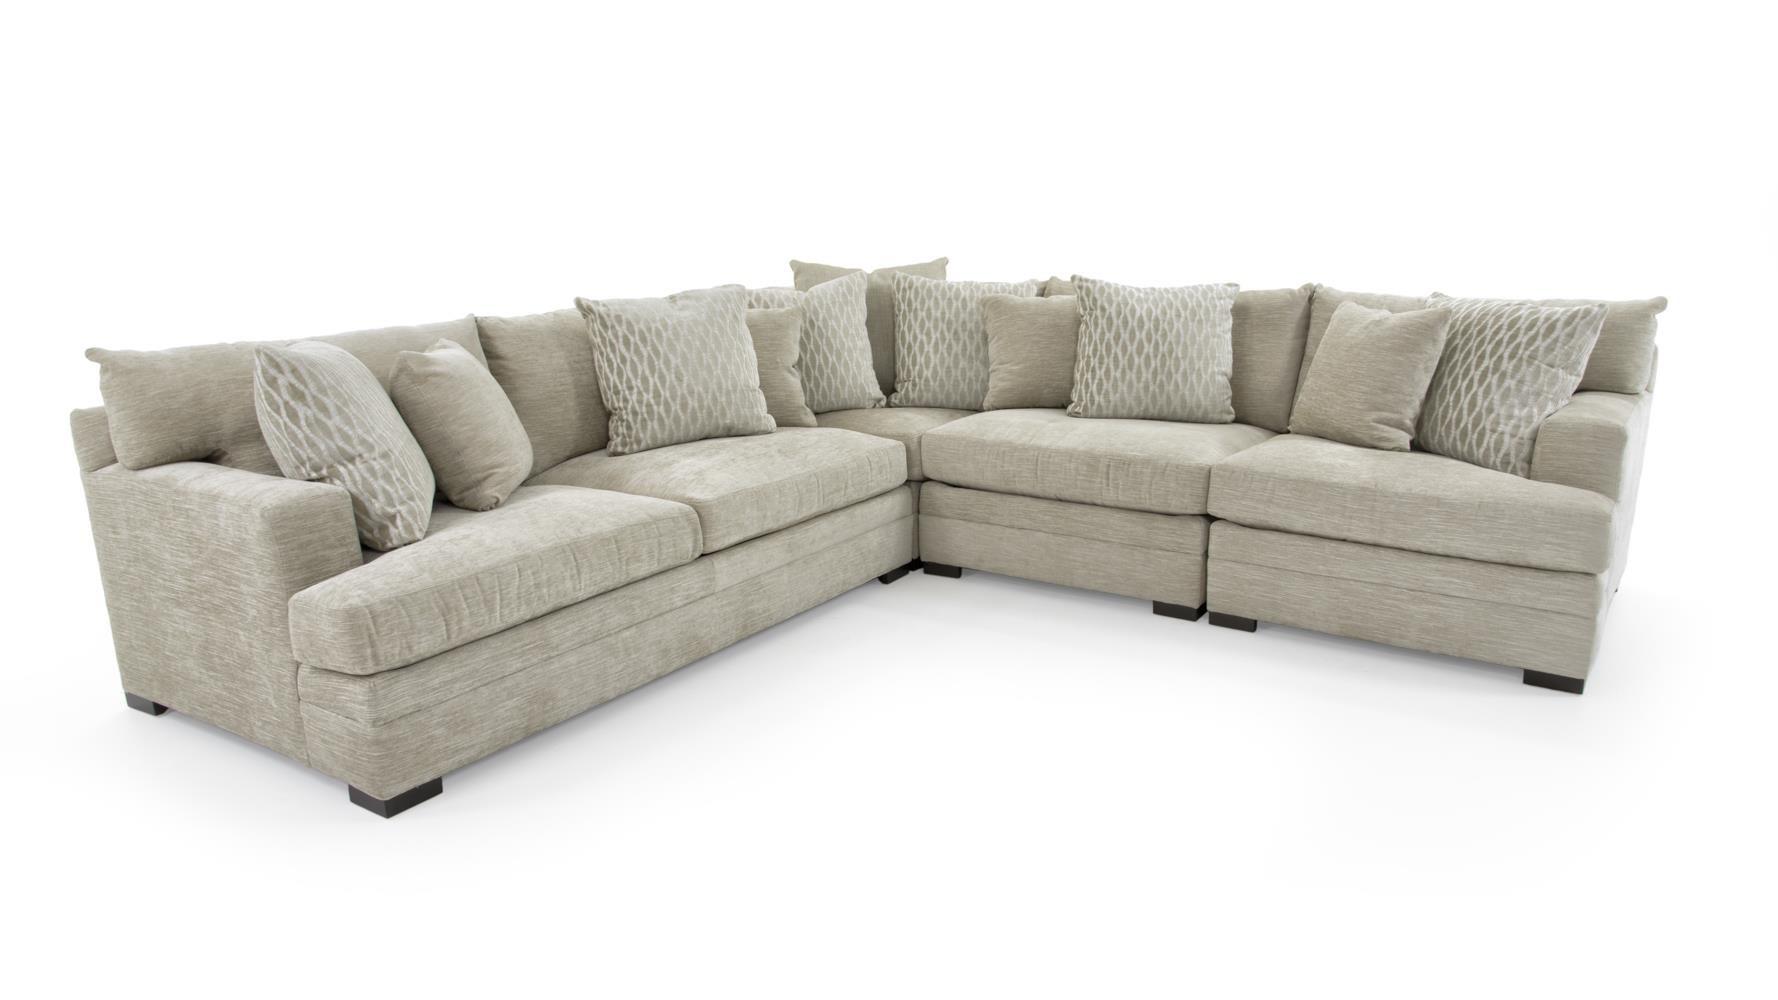 huntington sectional sofa italian bedroom furniture house 7100 43t 4331t 4351 4352t 61391 88 casual